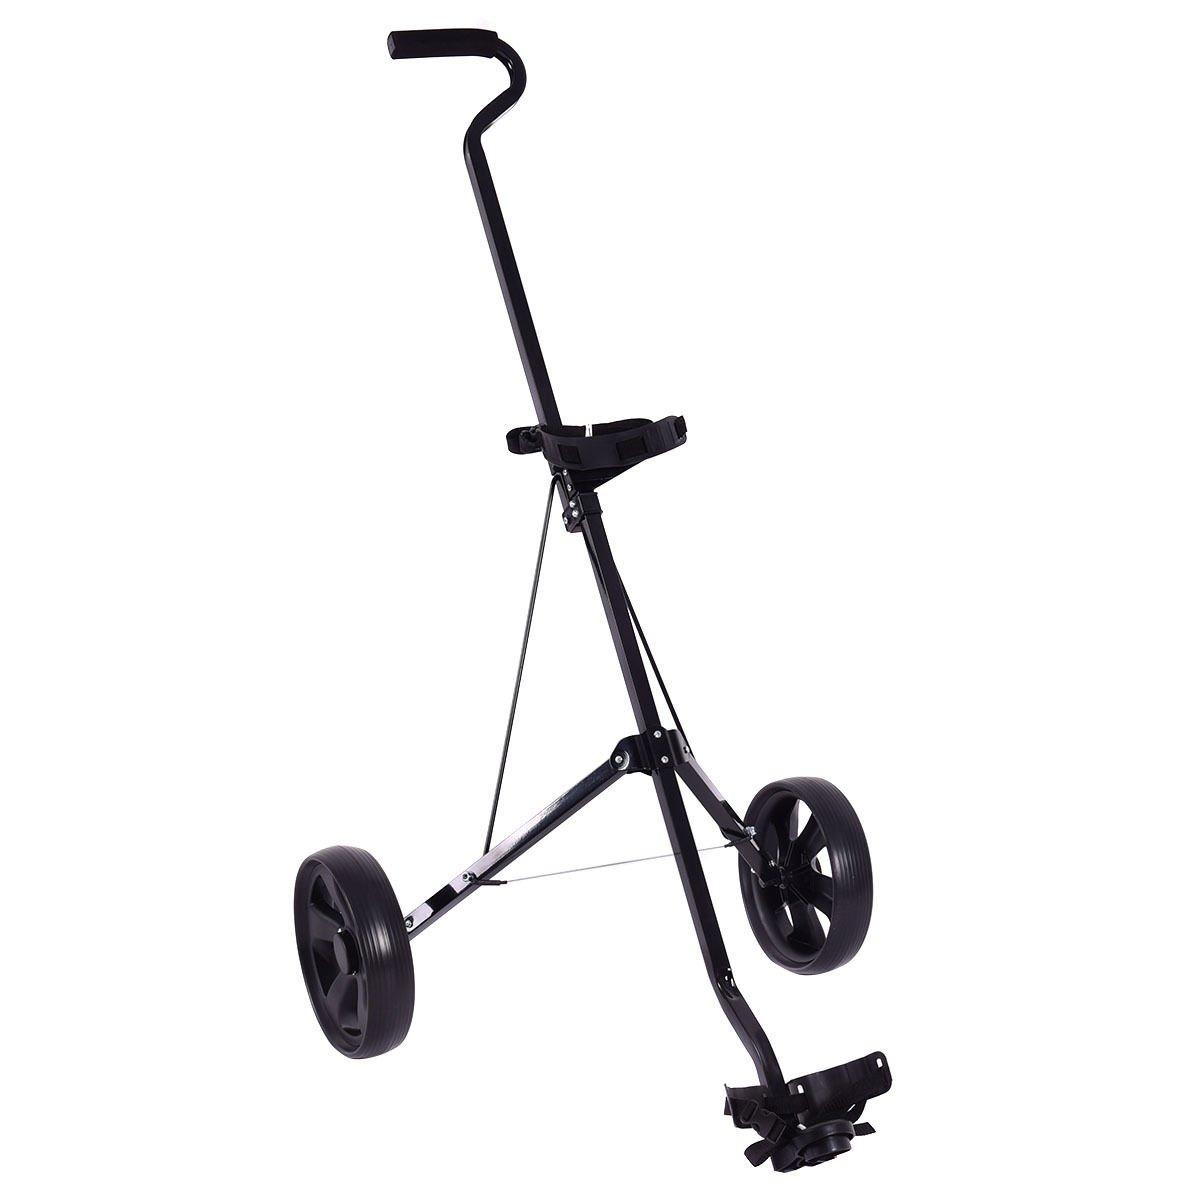 TANGKULA Lightweight Golf Pull Push Trolley Club Cart